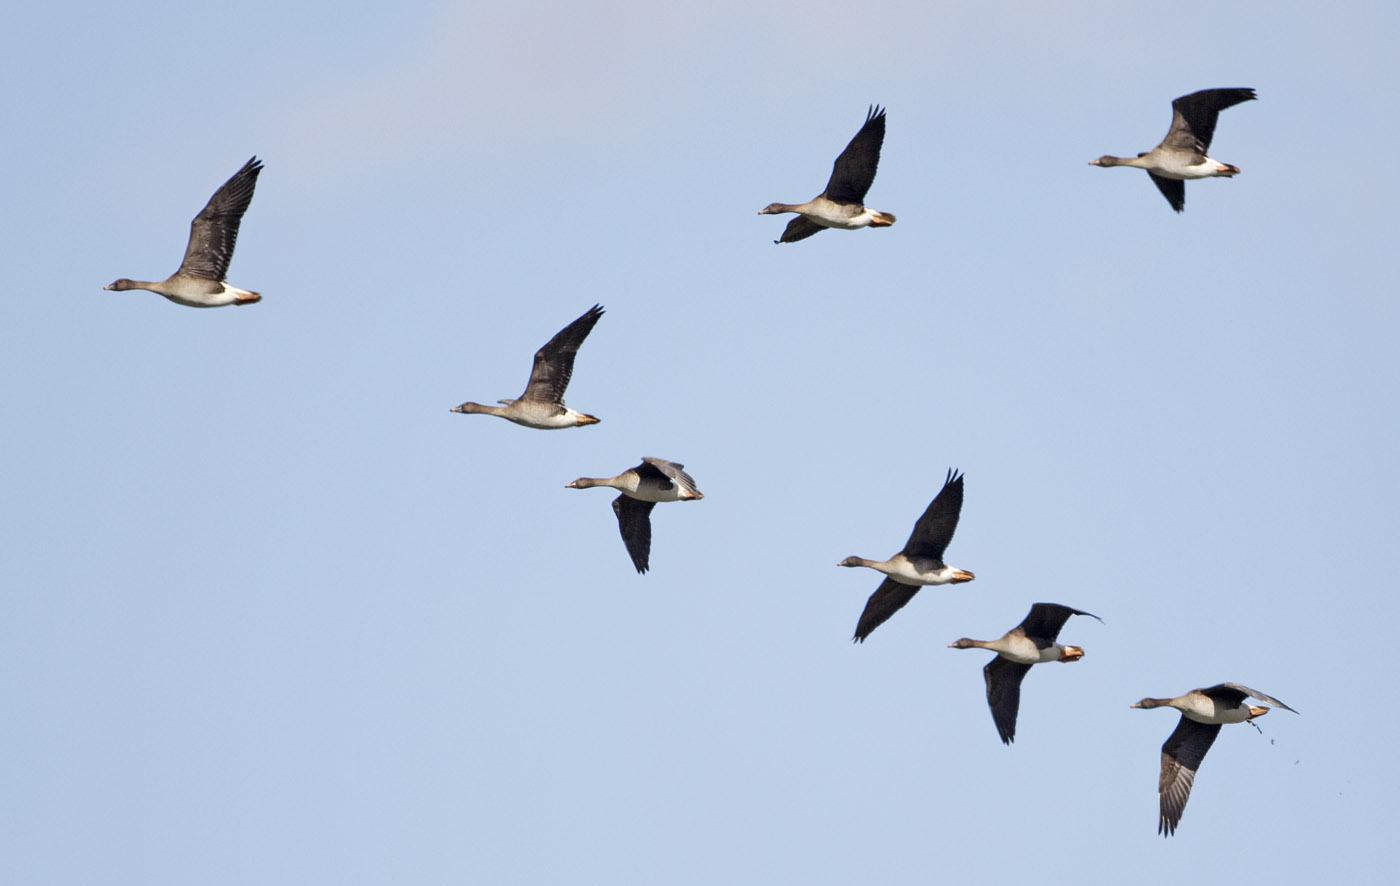 flying geese model essay